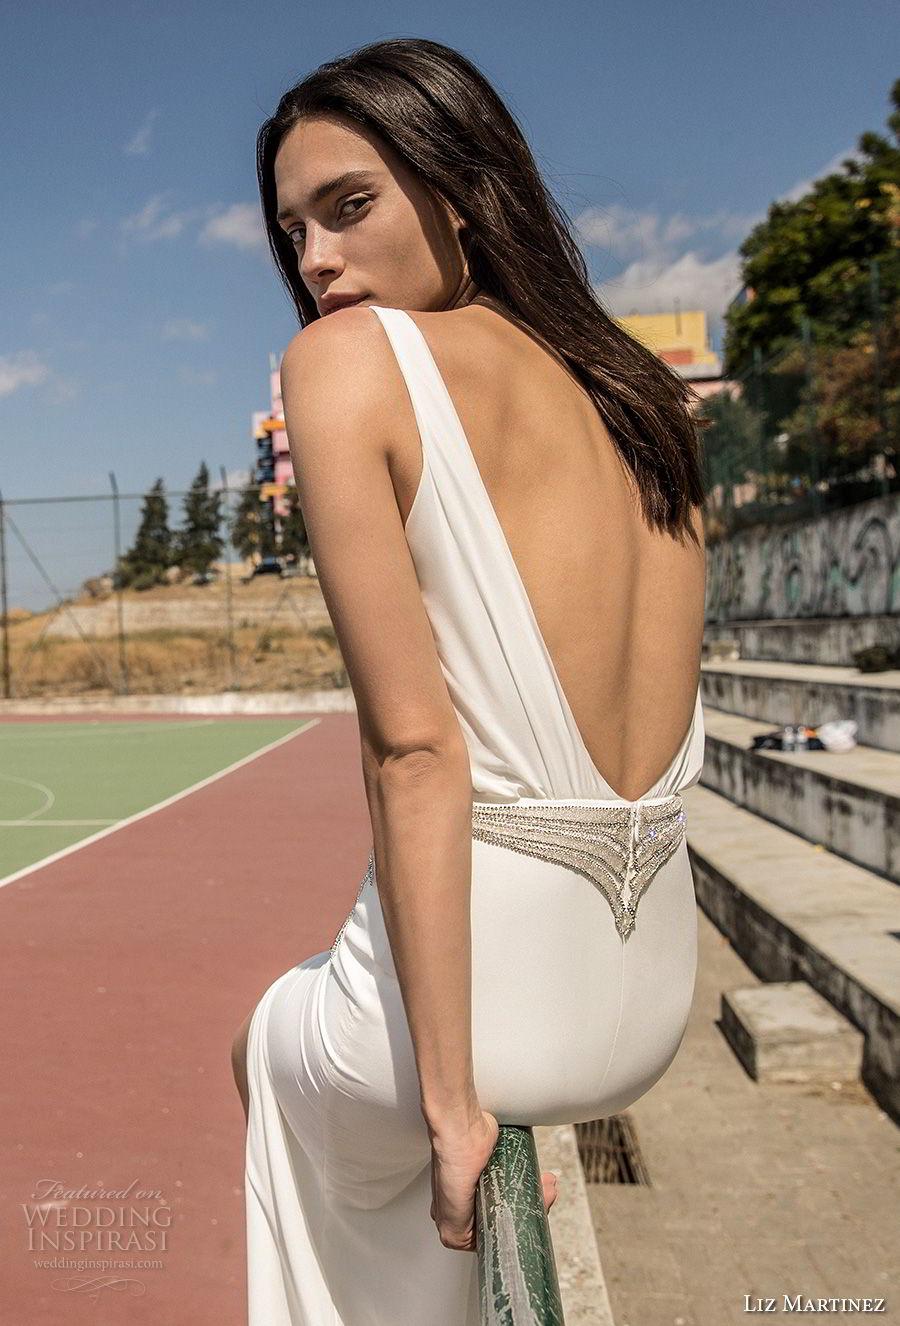 liz martinez 2018 lisbon sleeveless deep plunging v neck simple light embellishment high slit sexy sophiscated sheath wedding dress open scoop back sweep train (5) zbv